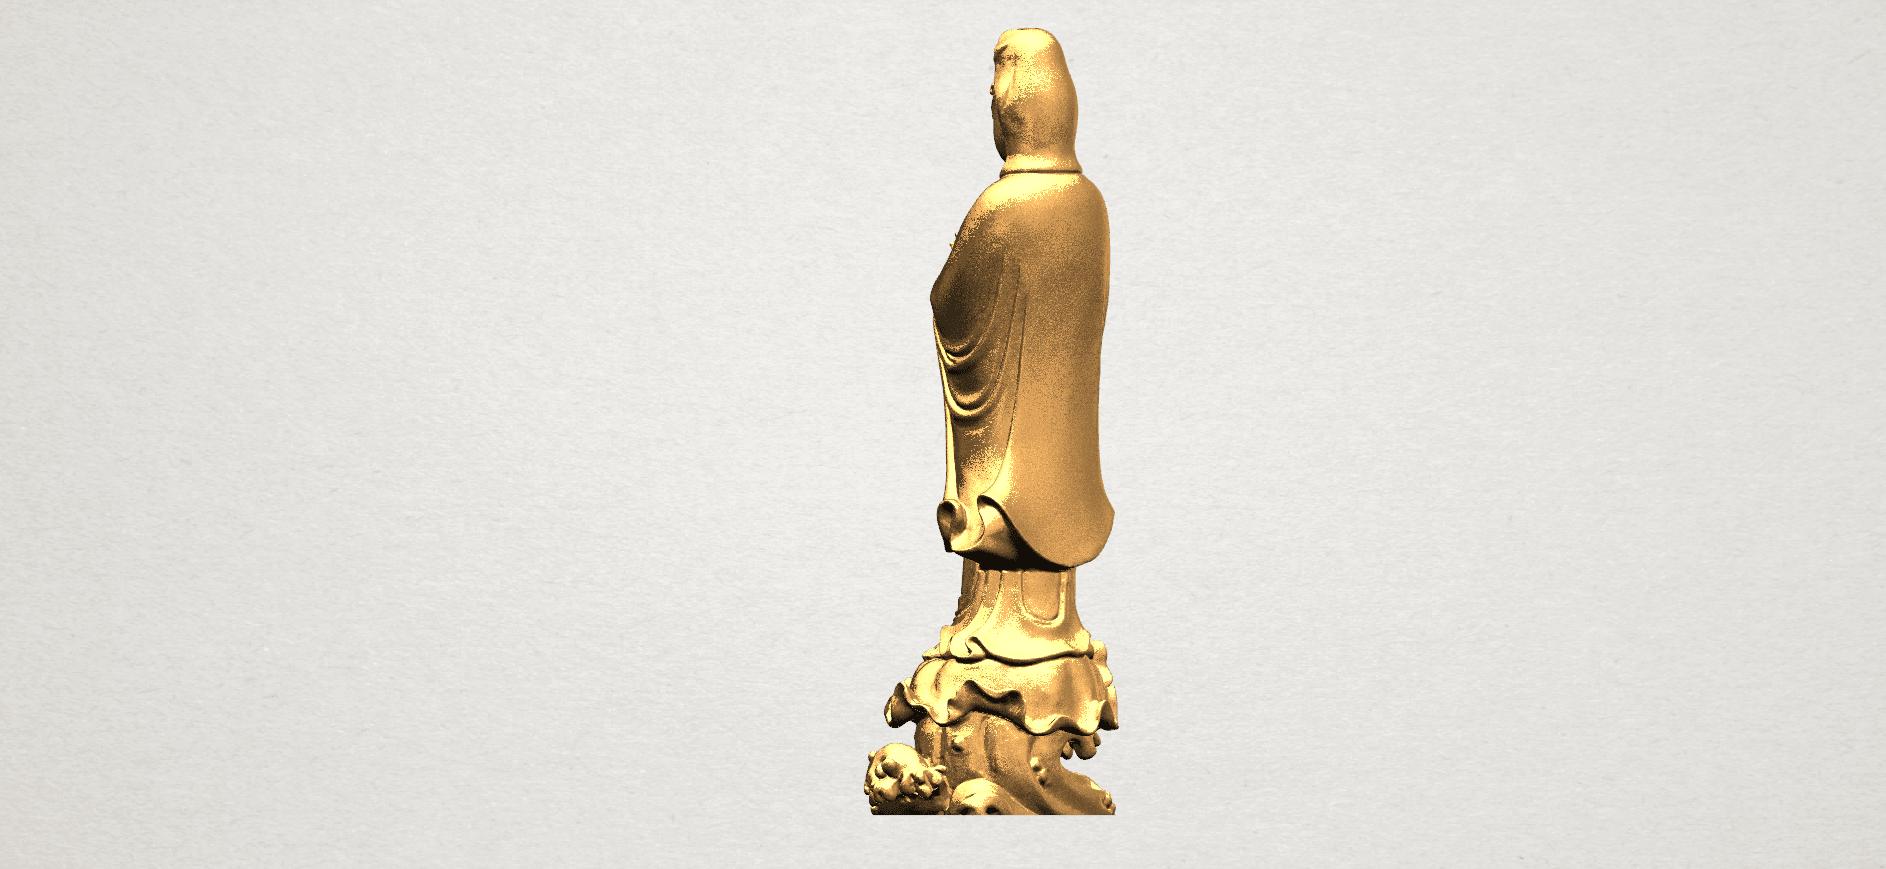 Avalokitesvara Buddha - Standing (v) A05.png Download free STL file Avalokitesvara Buddha - Standing 05 • 3D printer template, GeorgesNikkei